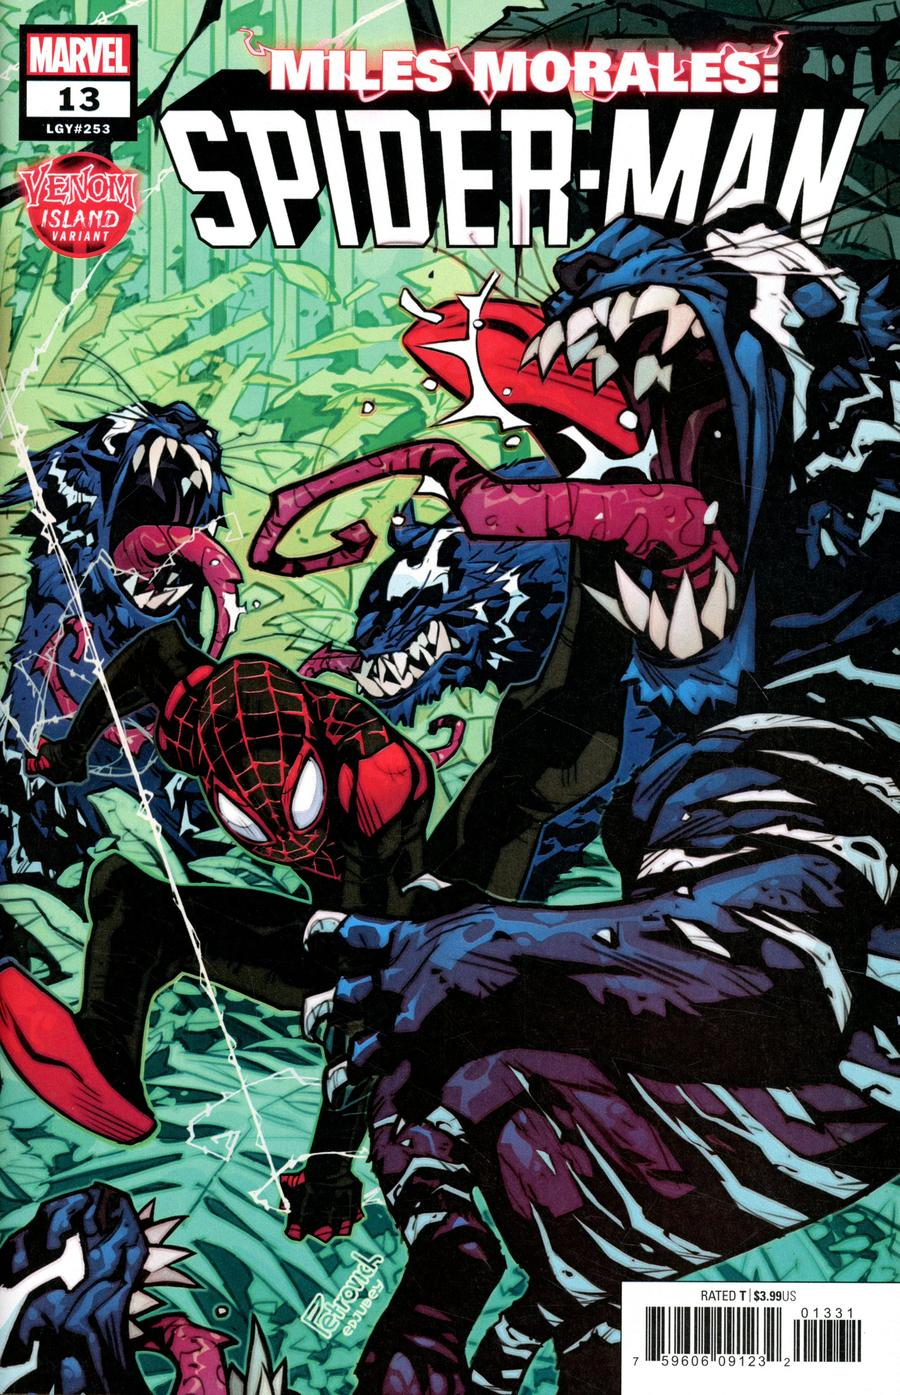 Miles Morales Spider-Man #13 Cover C Variant Eduard Petrovich Venom Island Cover